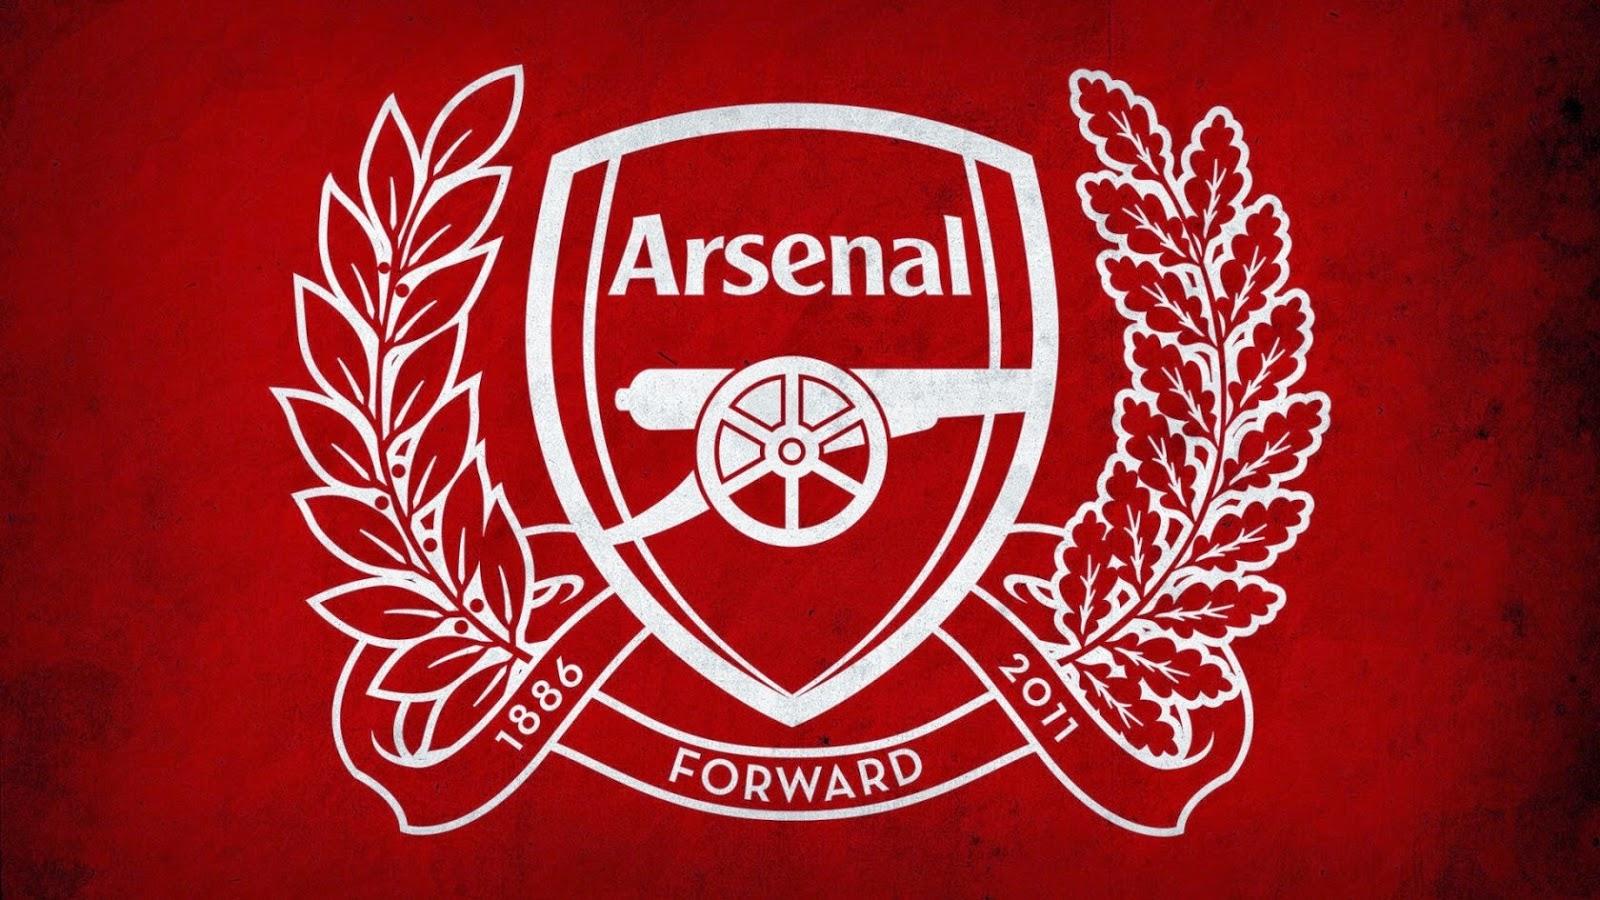 Arsenal Wallpapers 2020 Archives European Football Insider